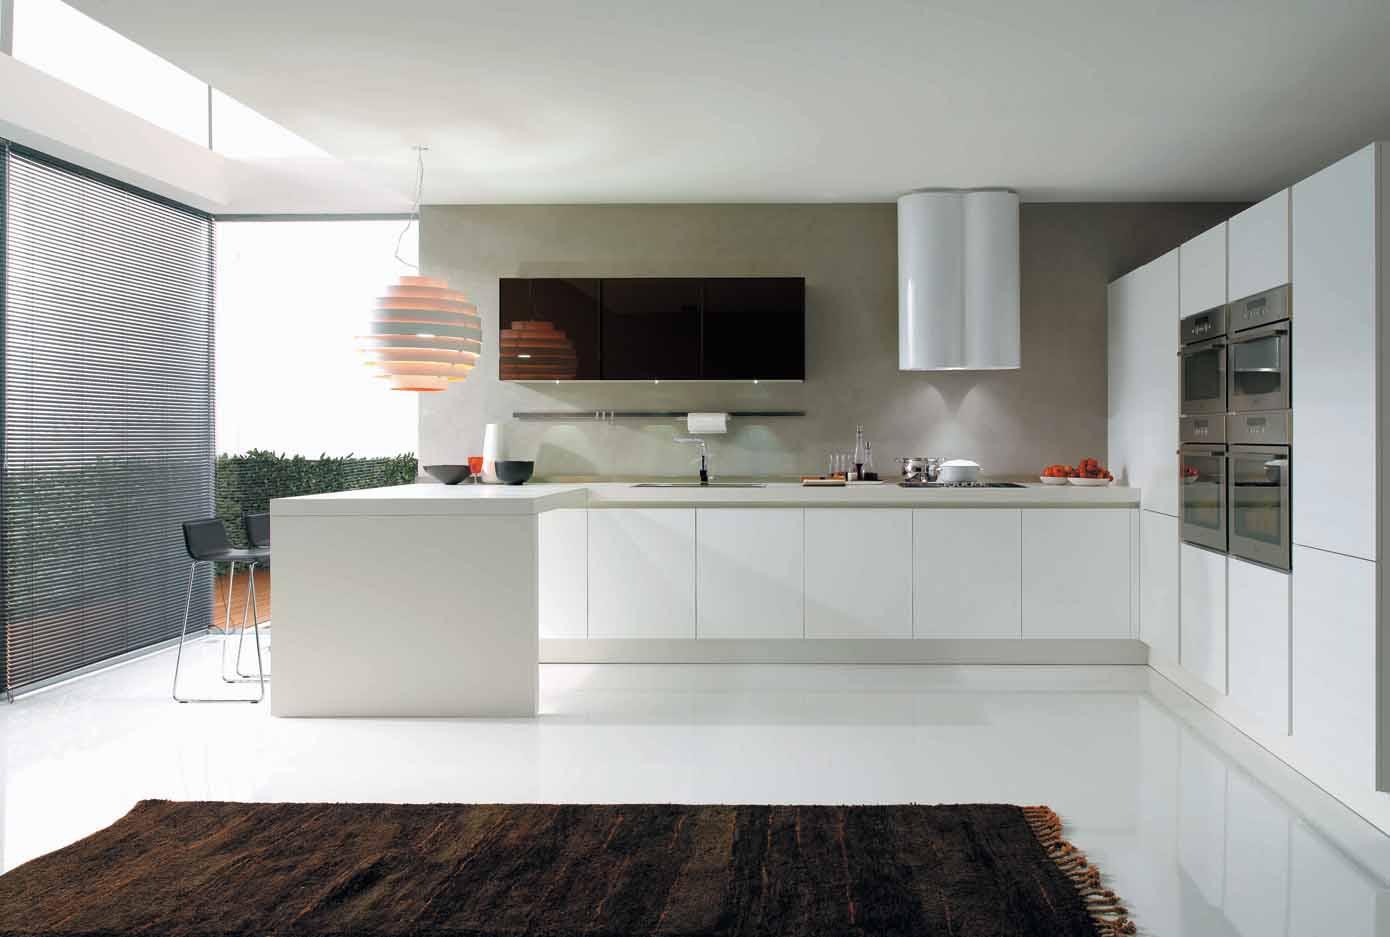 Filo Vanity Kitchen Design | Hawk Haven